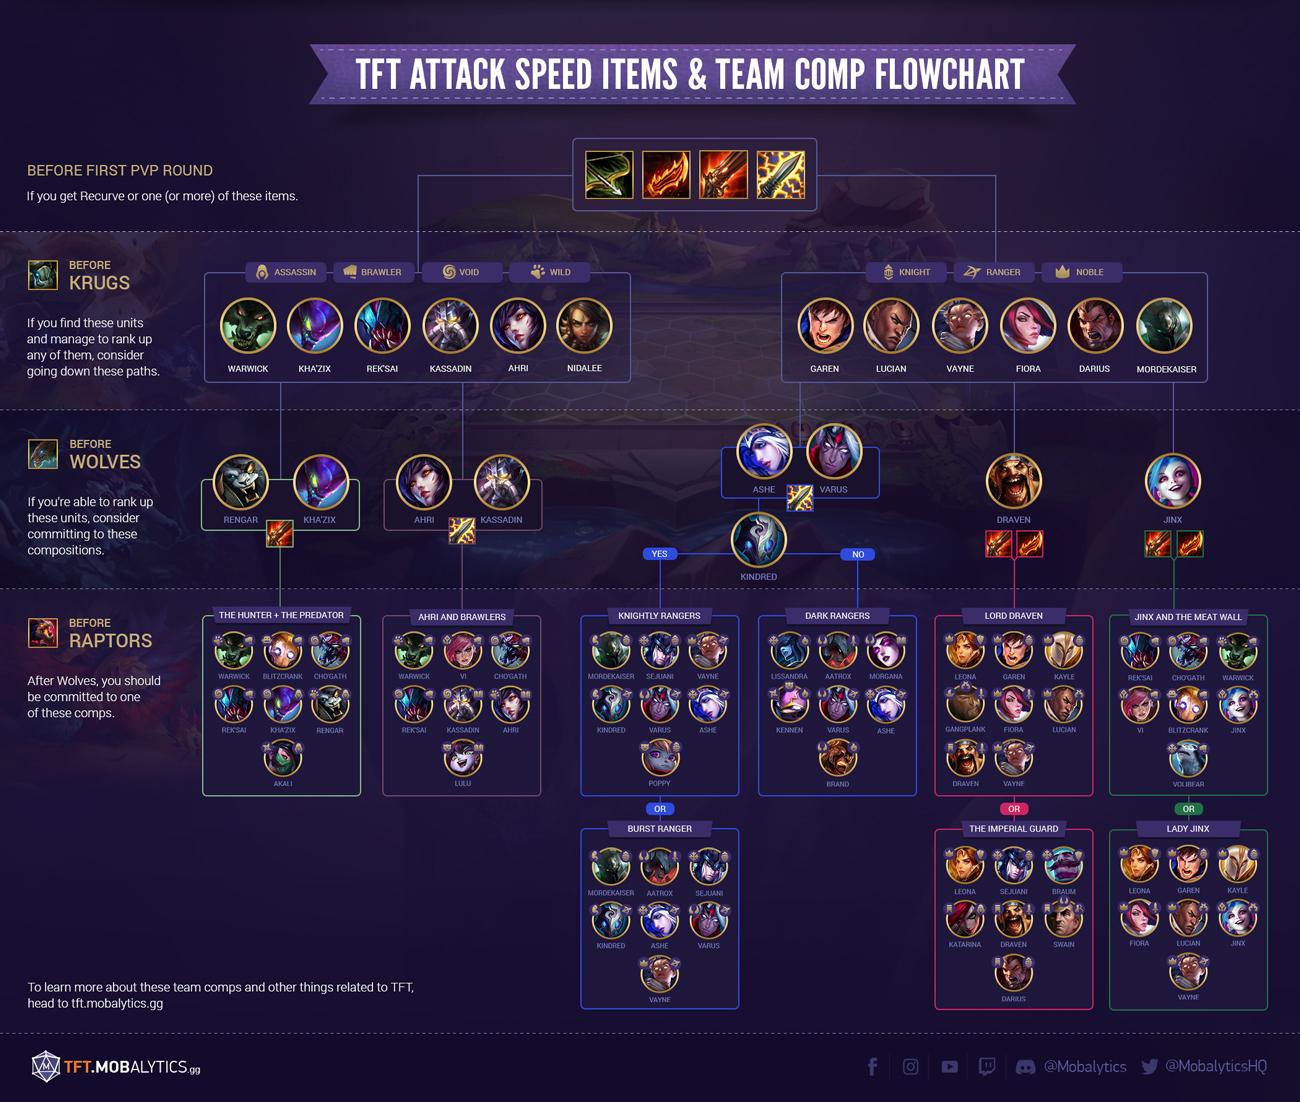 TFT Attack Speed Items + Team Comp Flowchart